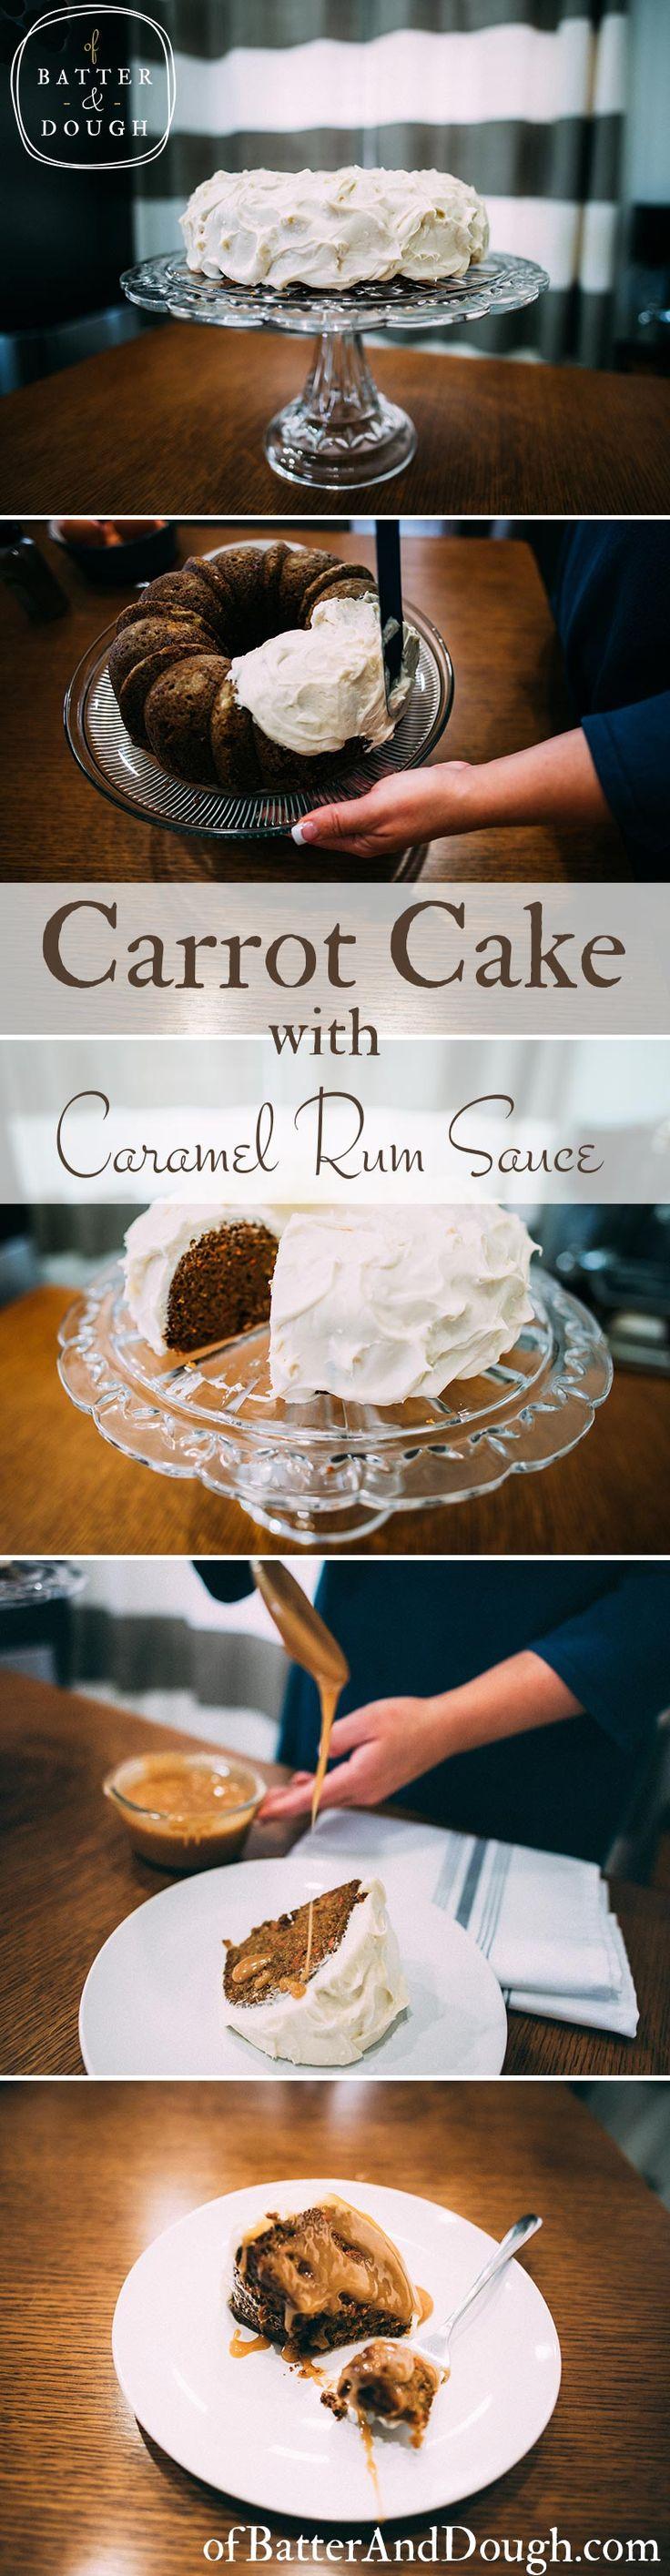 75 best Cake Recipes images on Pinterest